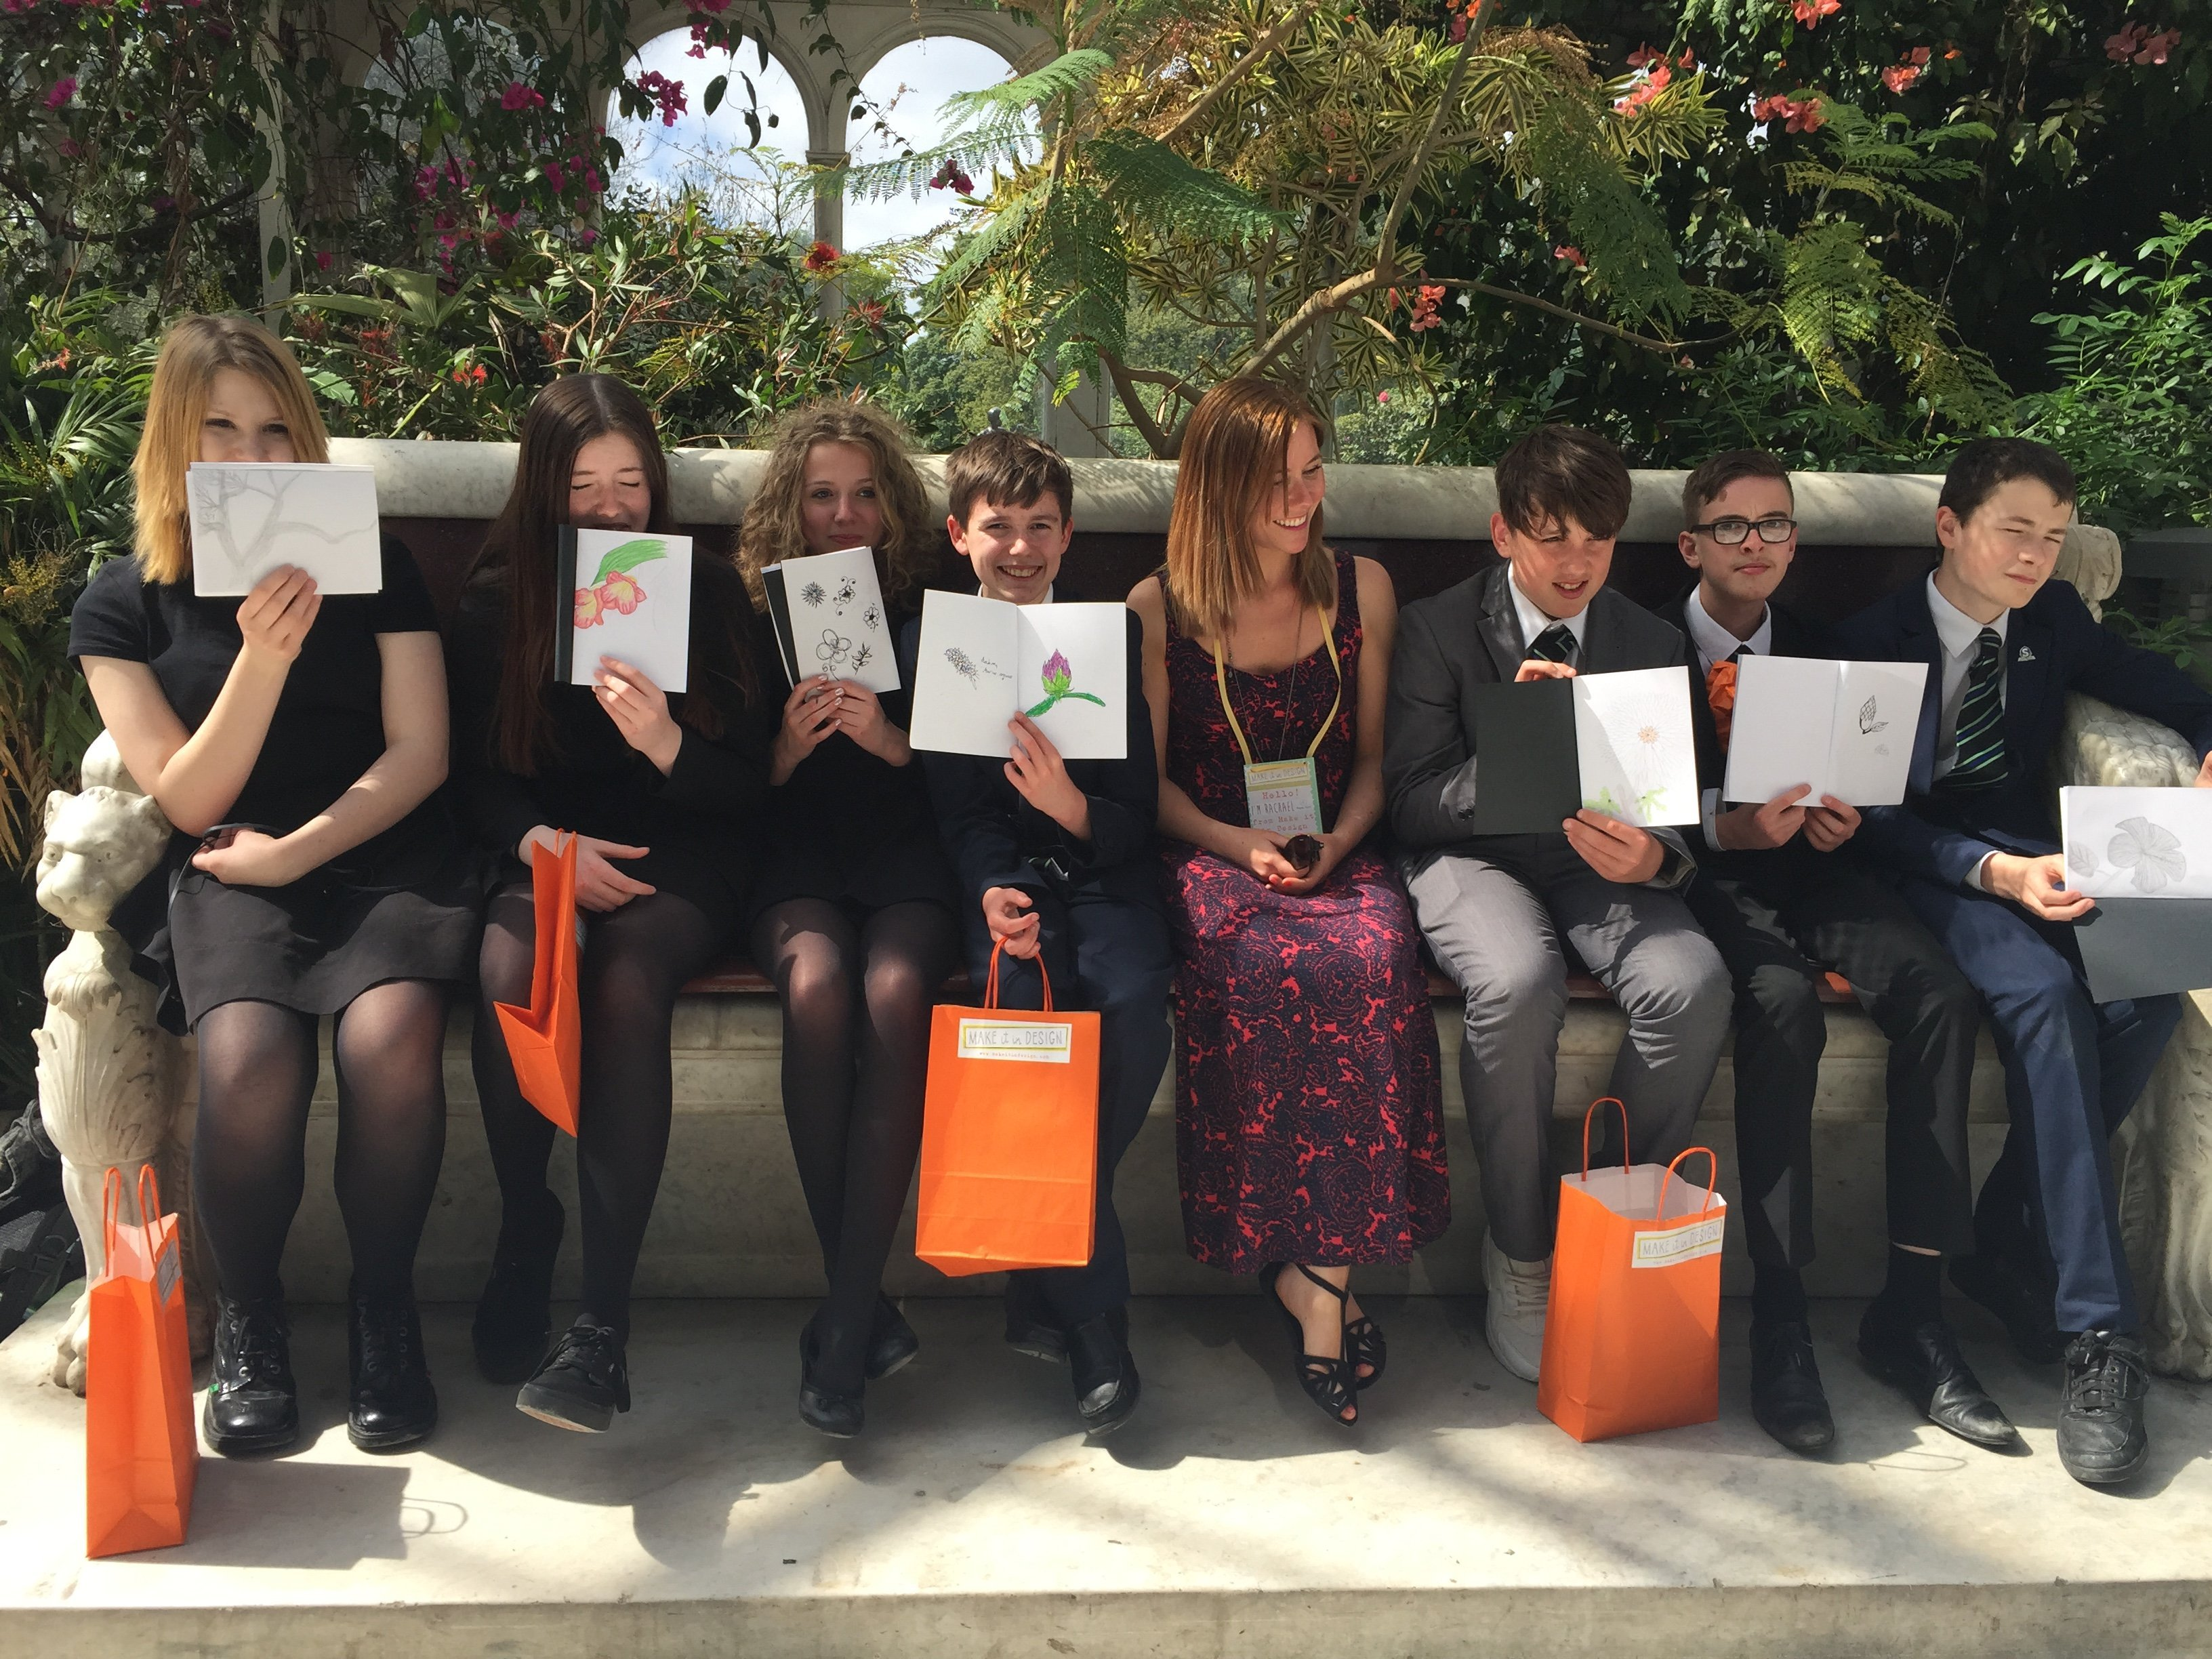 Rachael and students from Sandymoor School